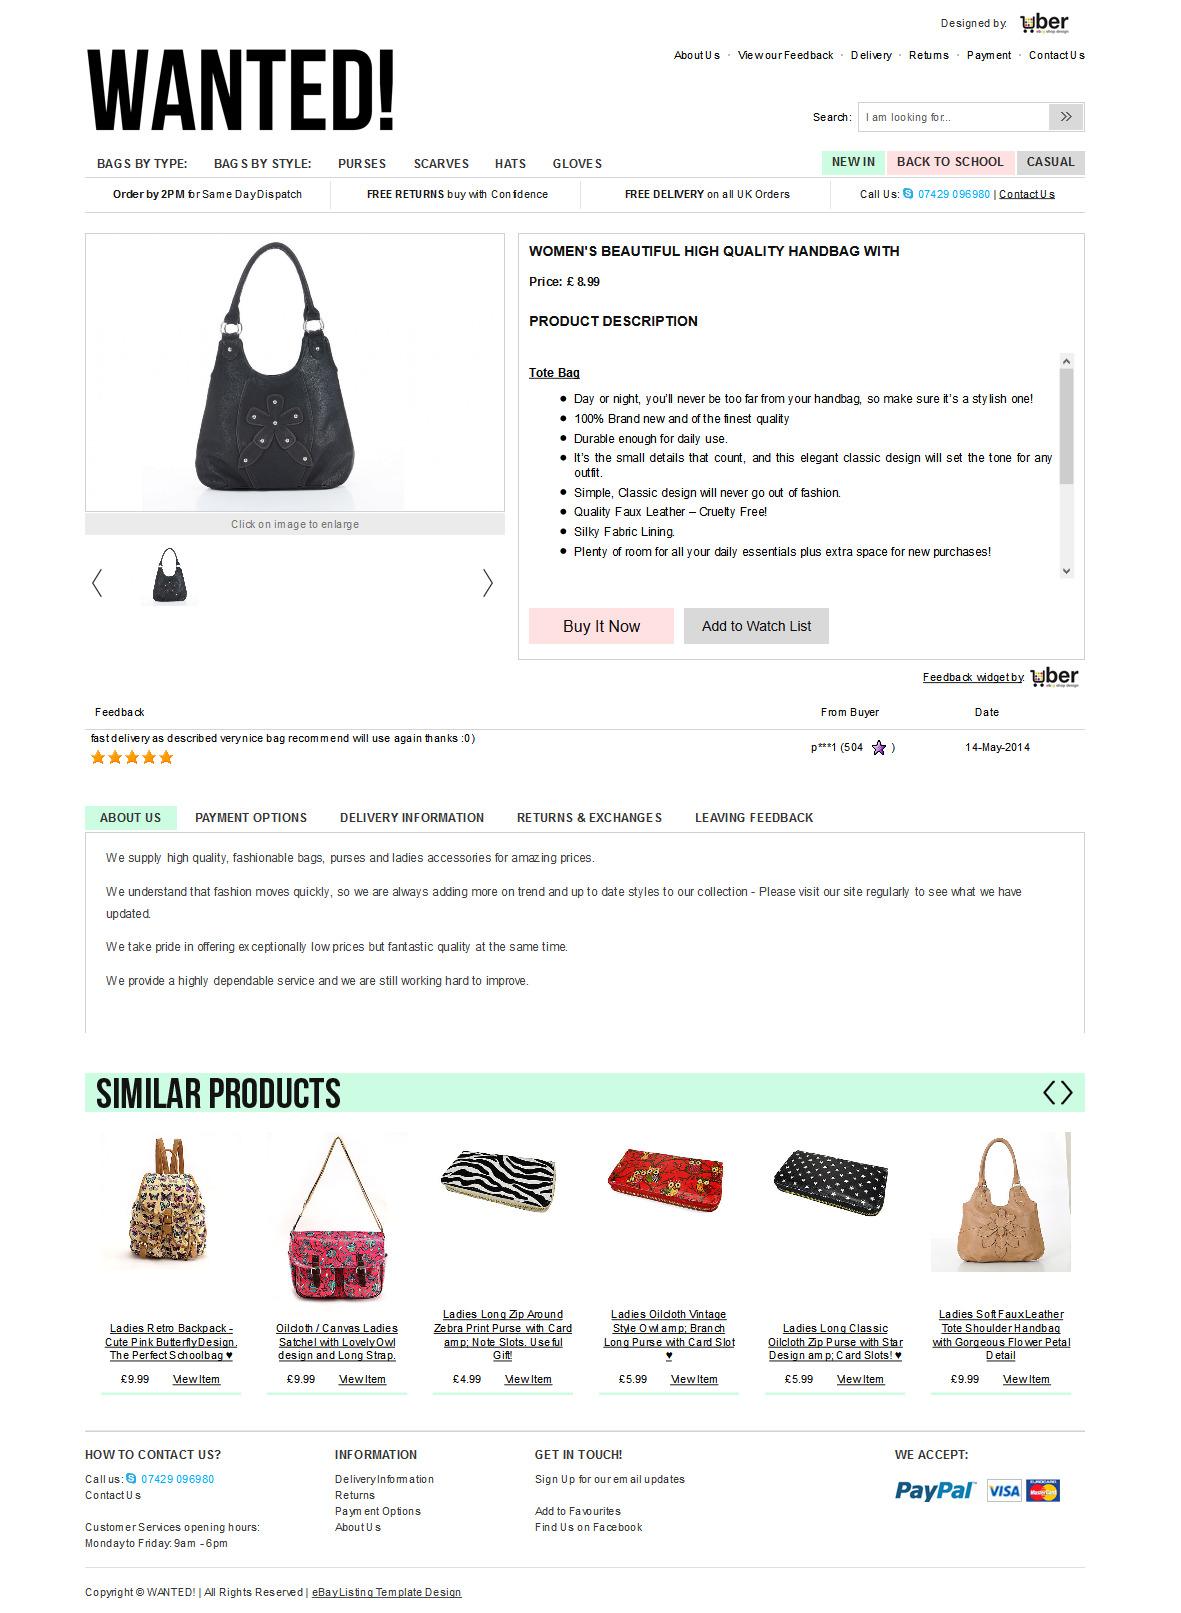 WantedBags ebay item template design